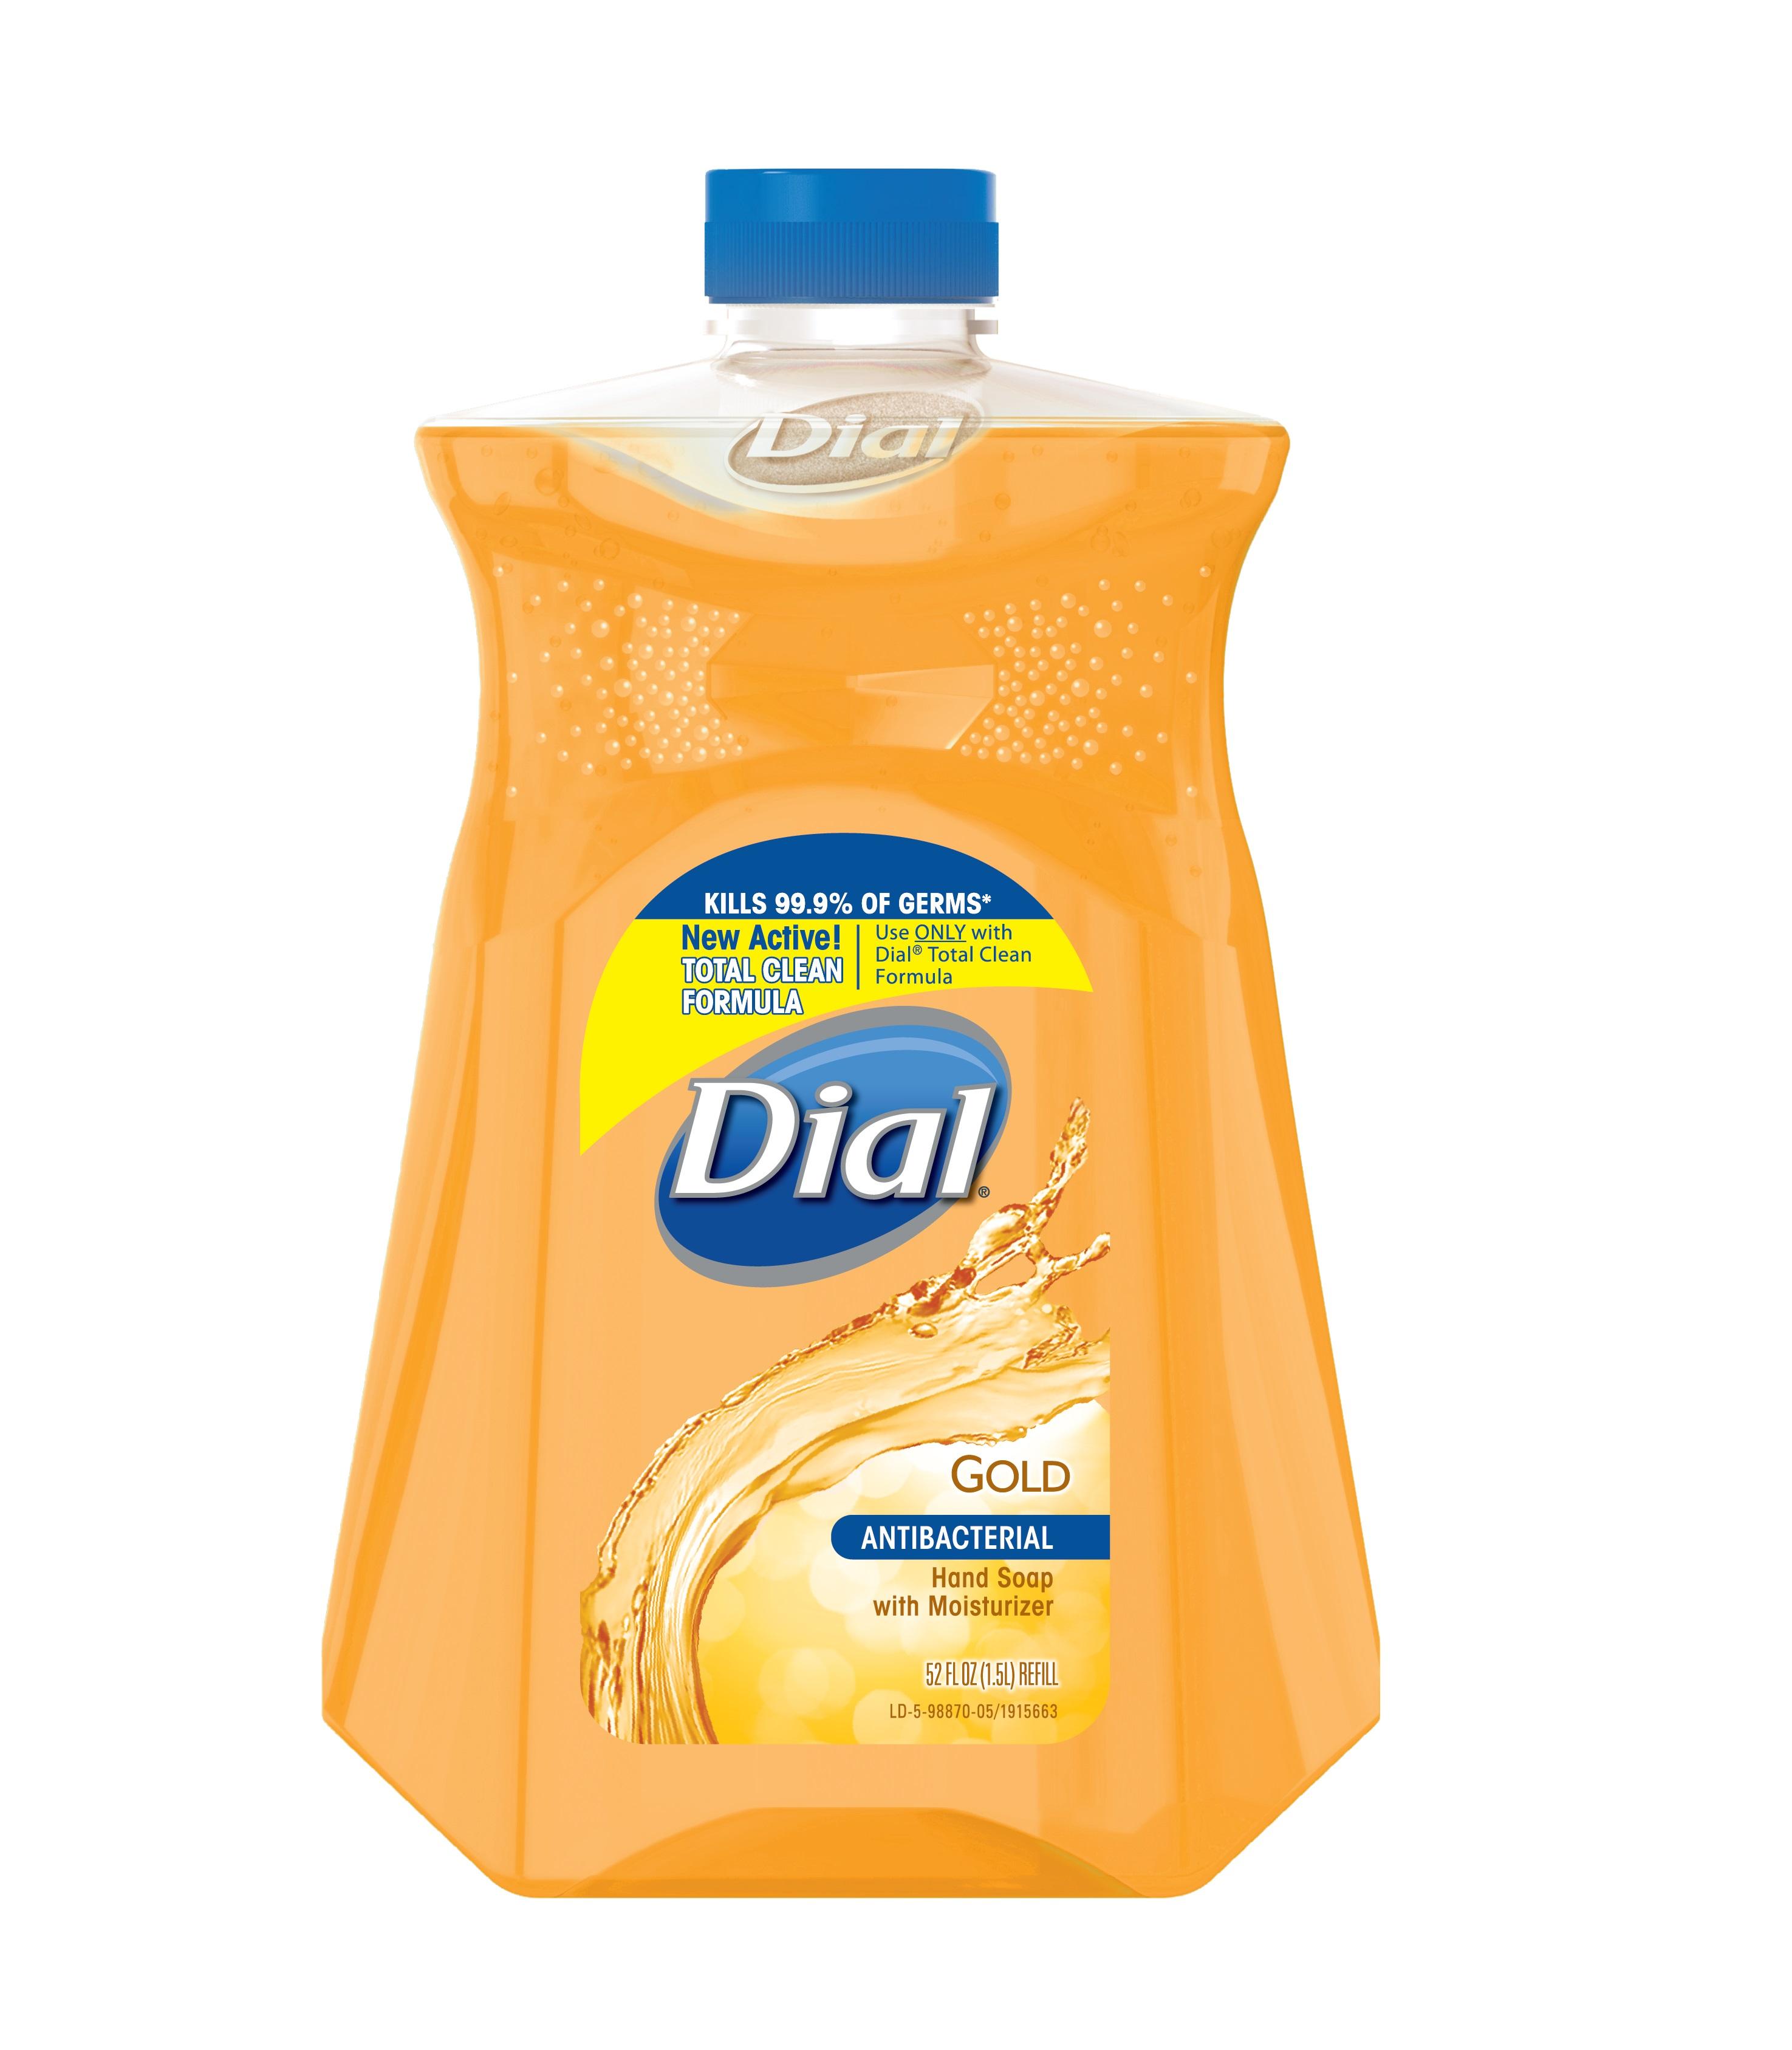 Dailymed Dial Antibacterial Hand Wash Dial Gold